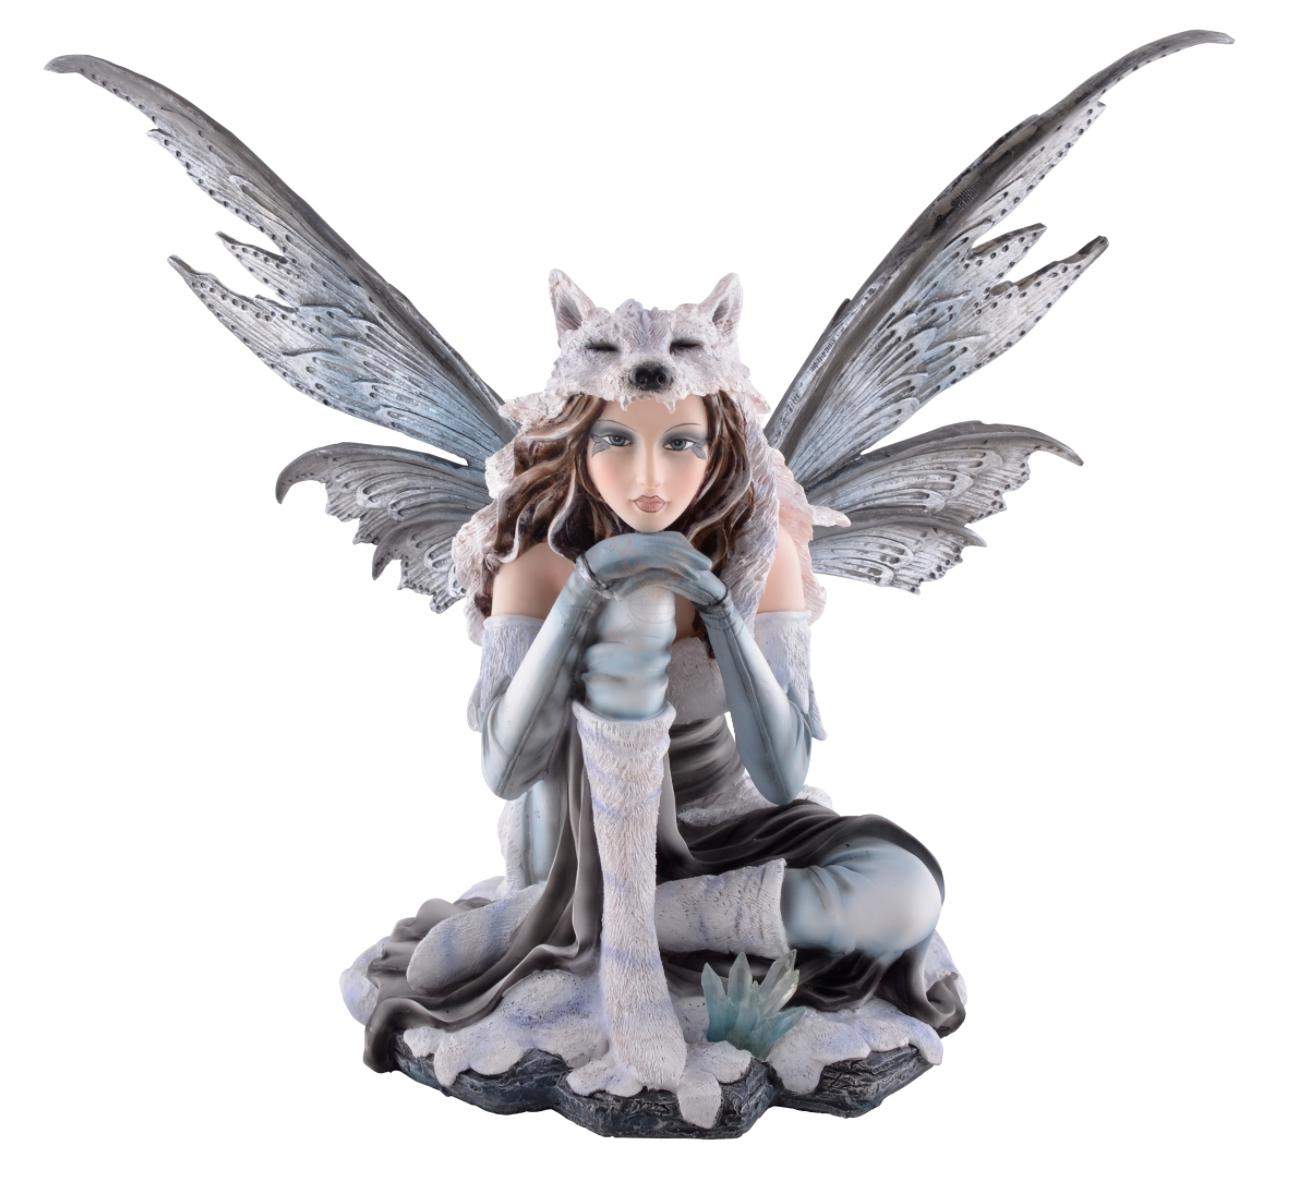 wolfsfee lupa sitzt im schnee figur fee elfe fairy feenfigur feenfiguren winter ebay. Black Bedroom Furniture Sets. Home Design Ideas